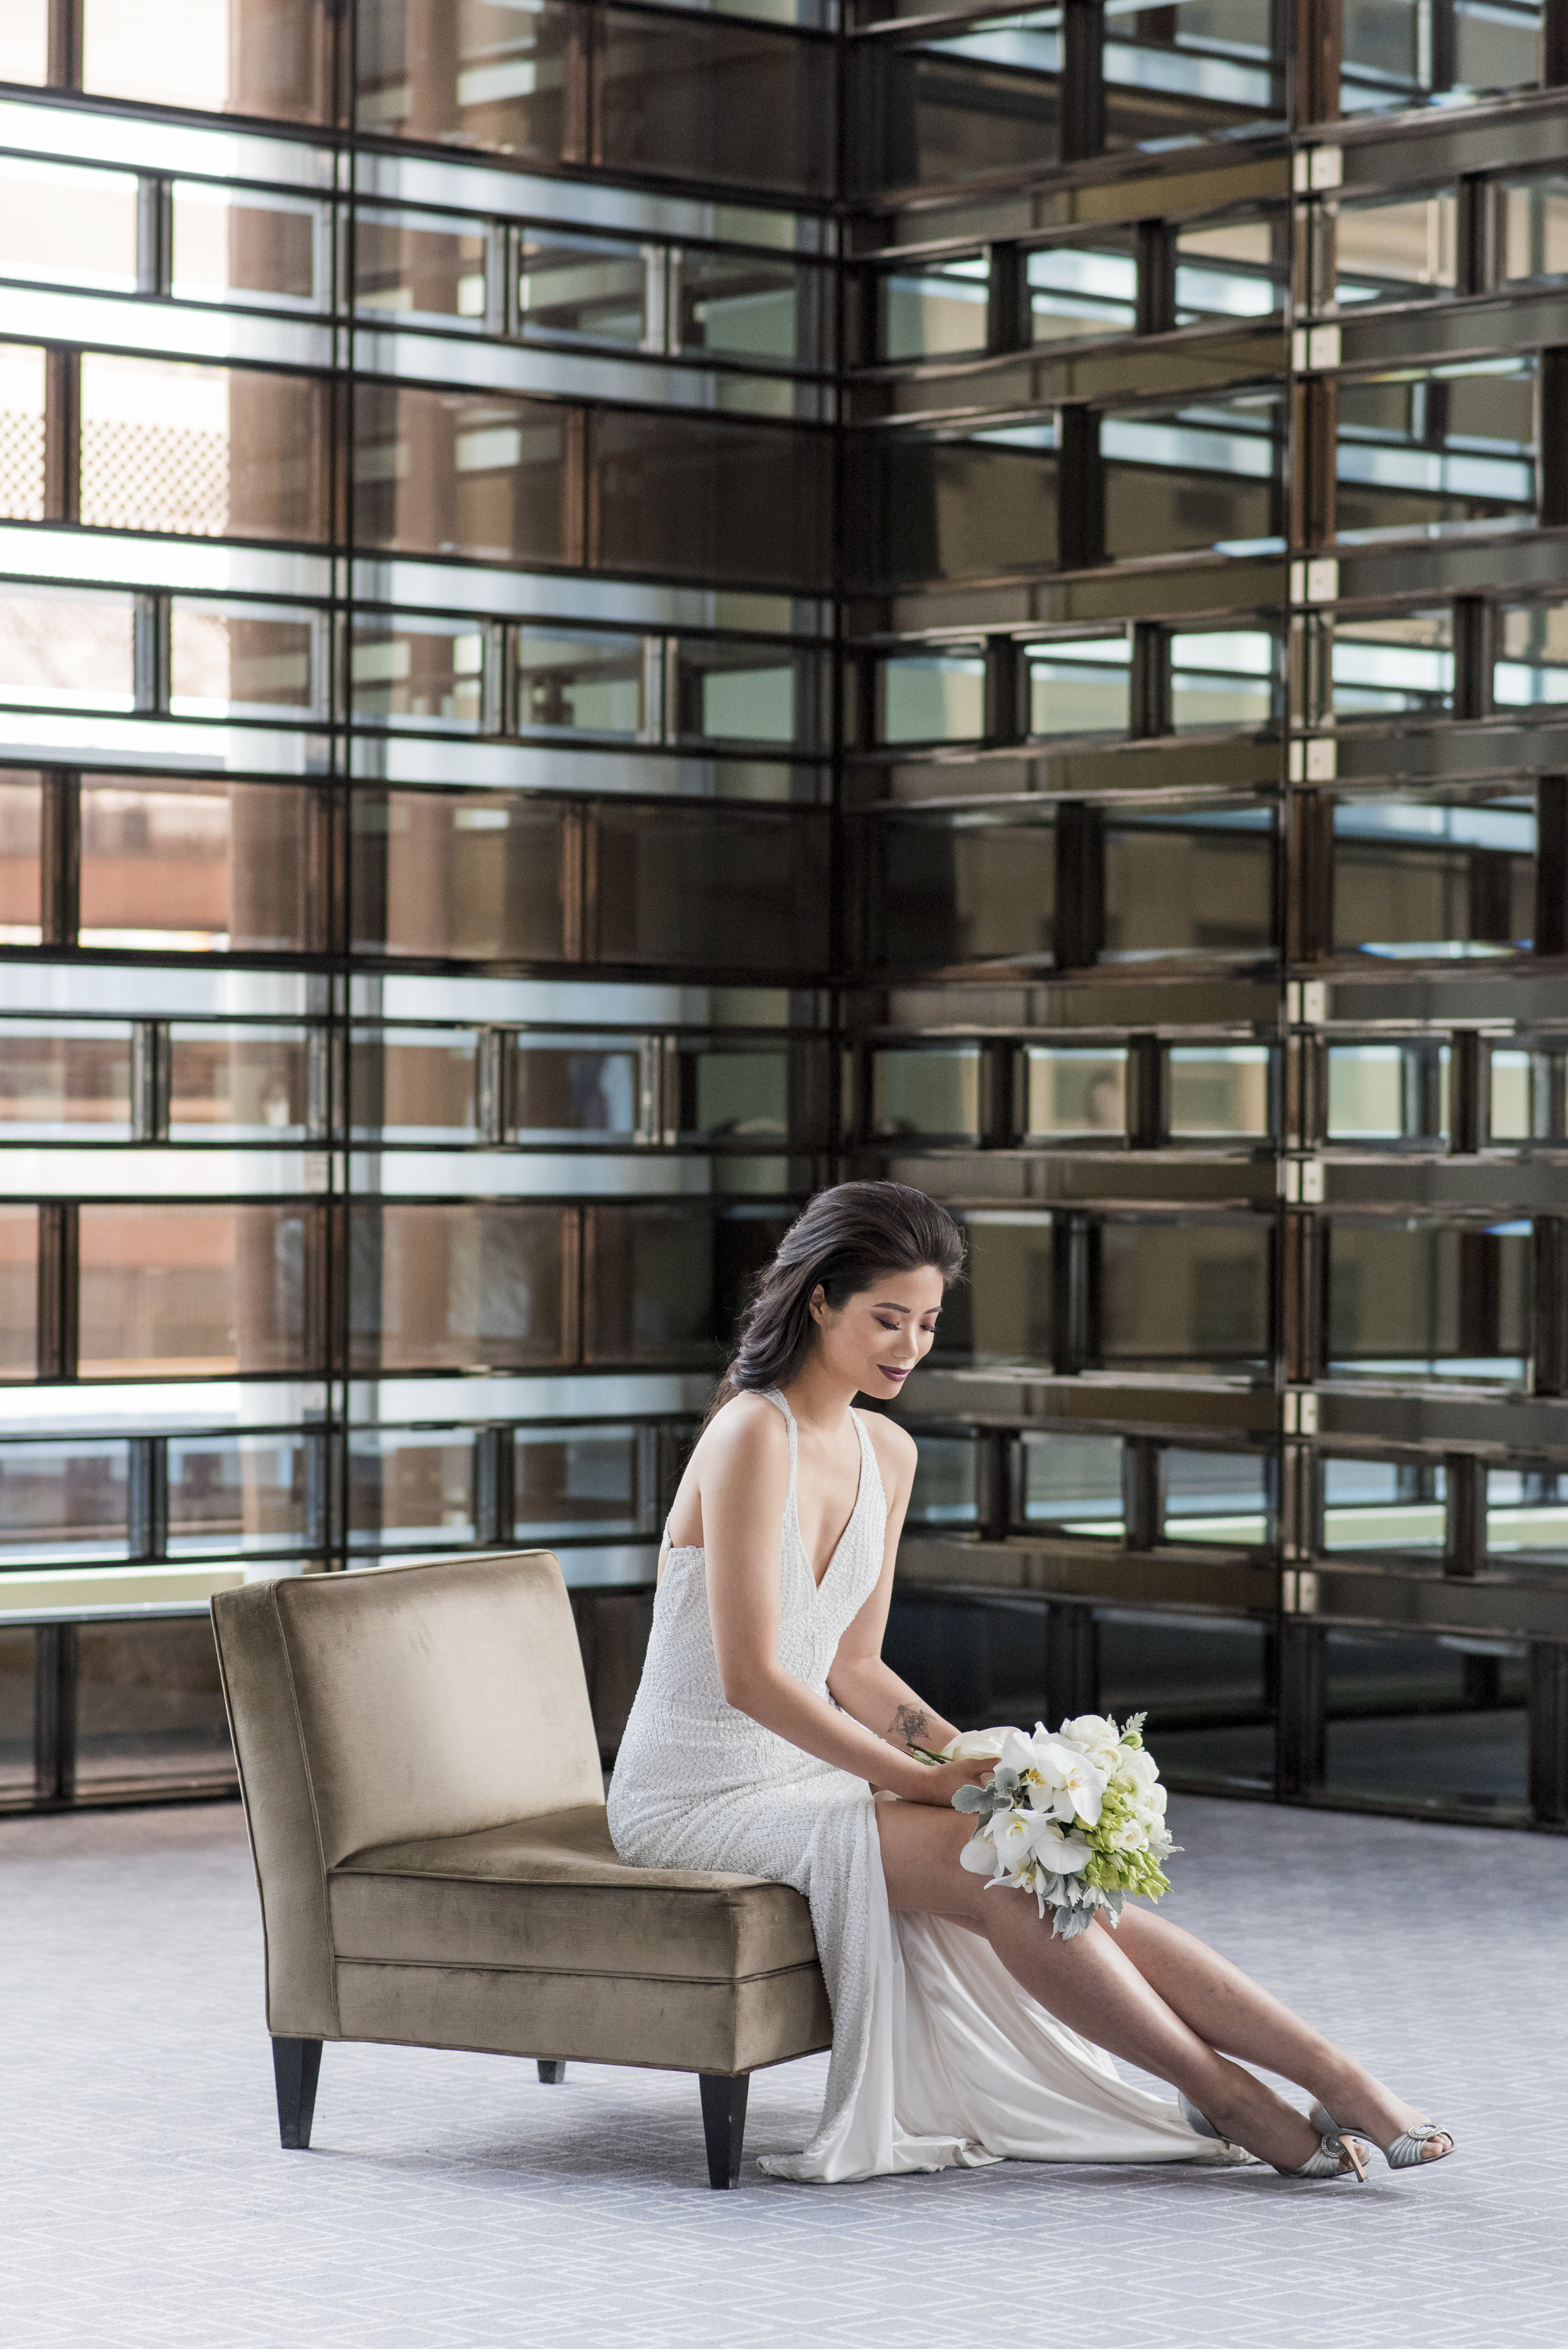 August In Bloom - Bride - The Suited Groom (The Bridal Affair)